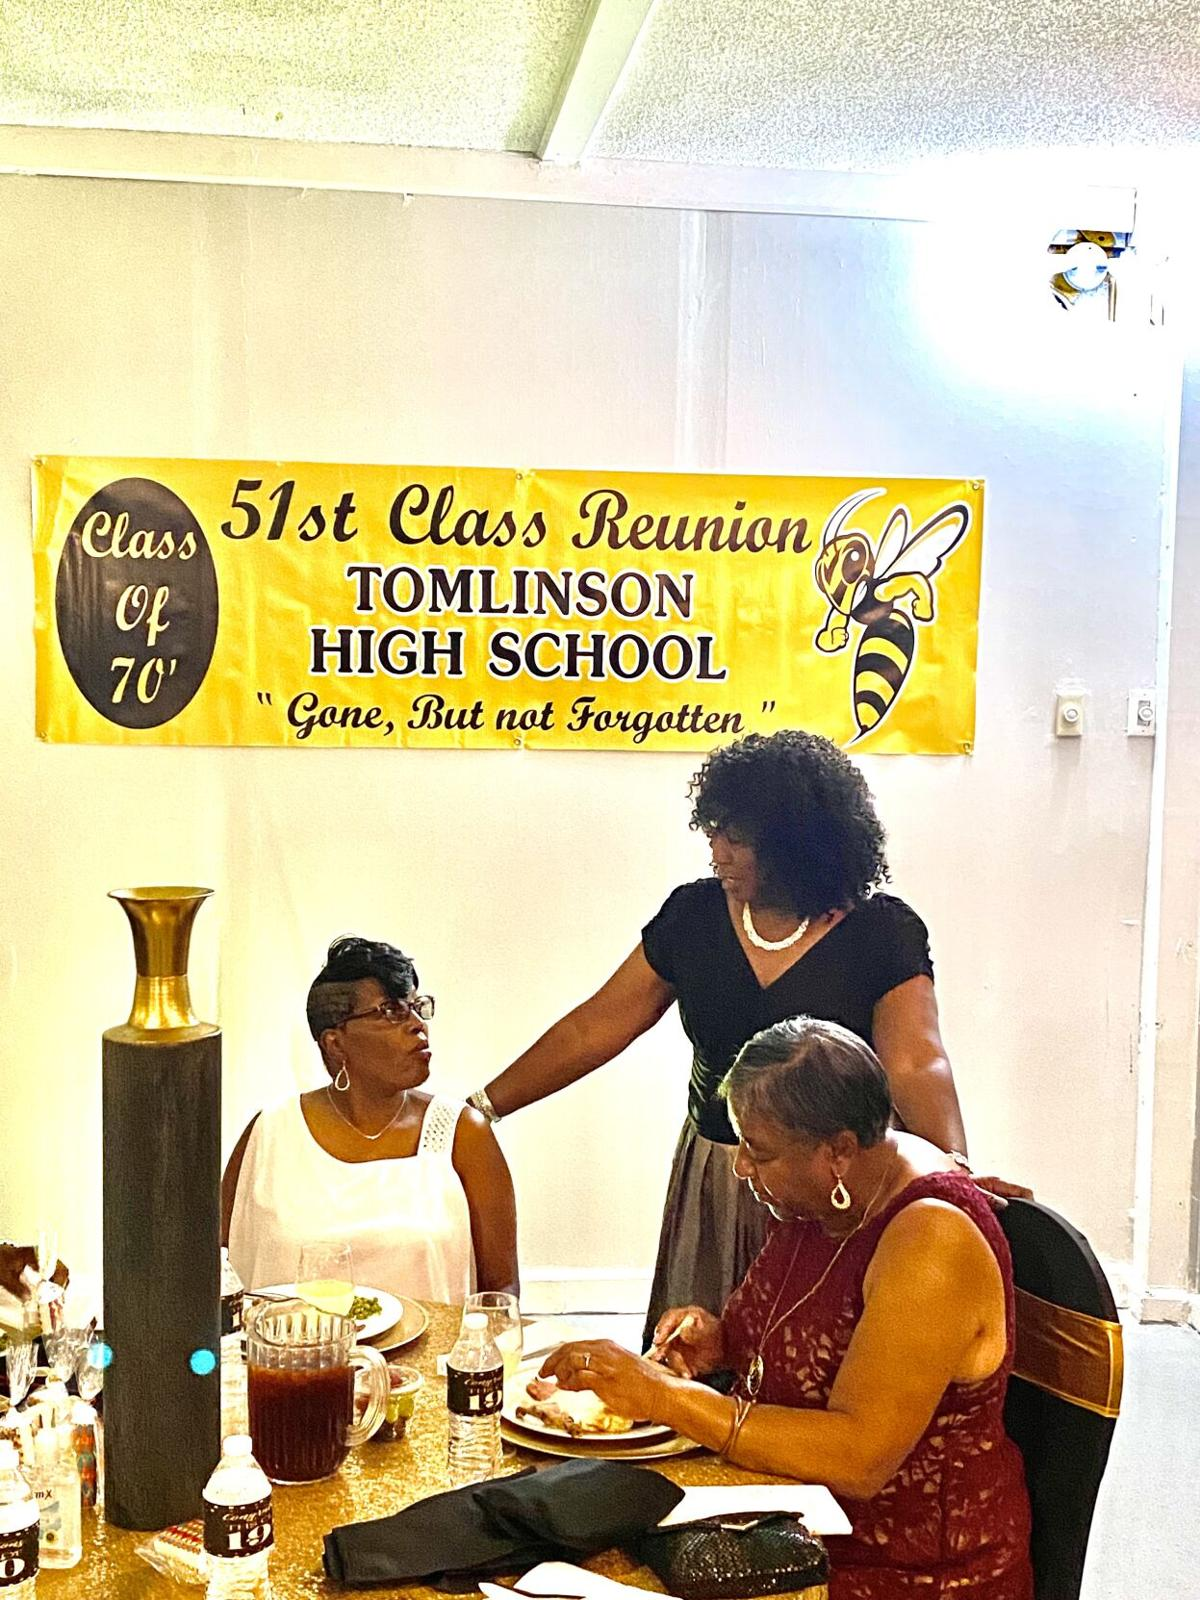 Tomlinson High School Reunion pic1